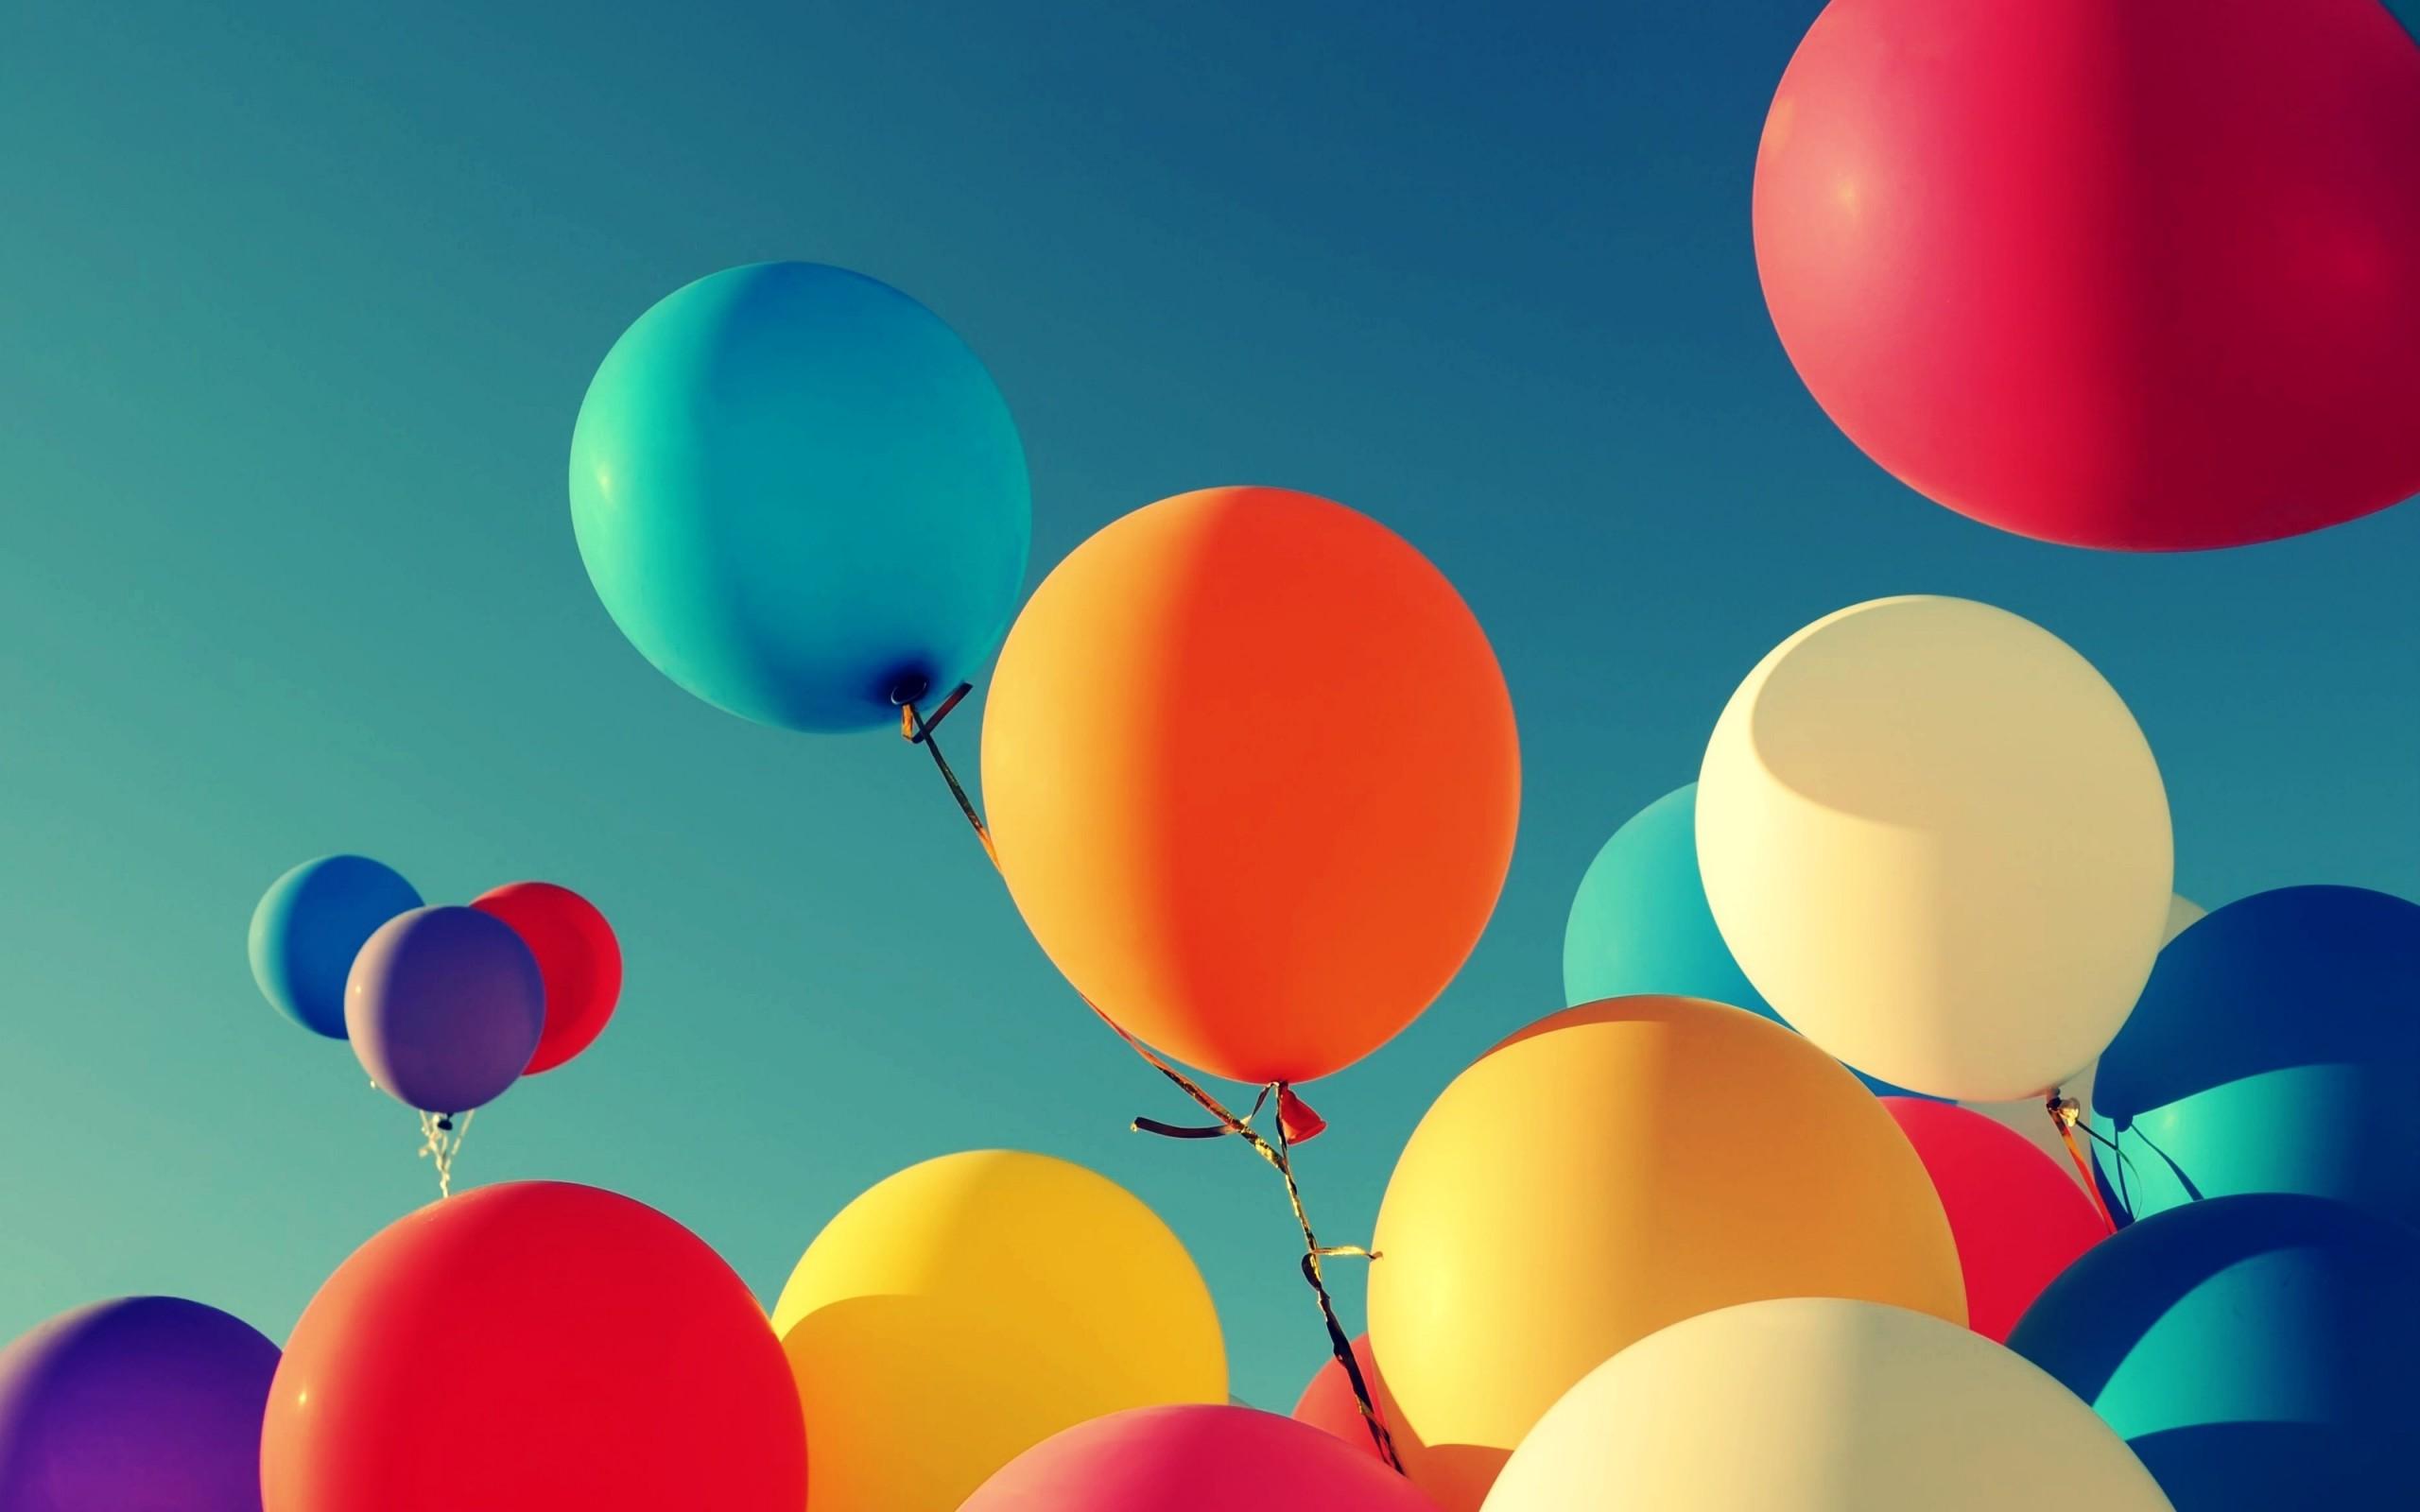 free-balloon-wallpaper-2560x1600